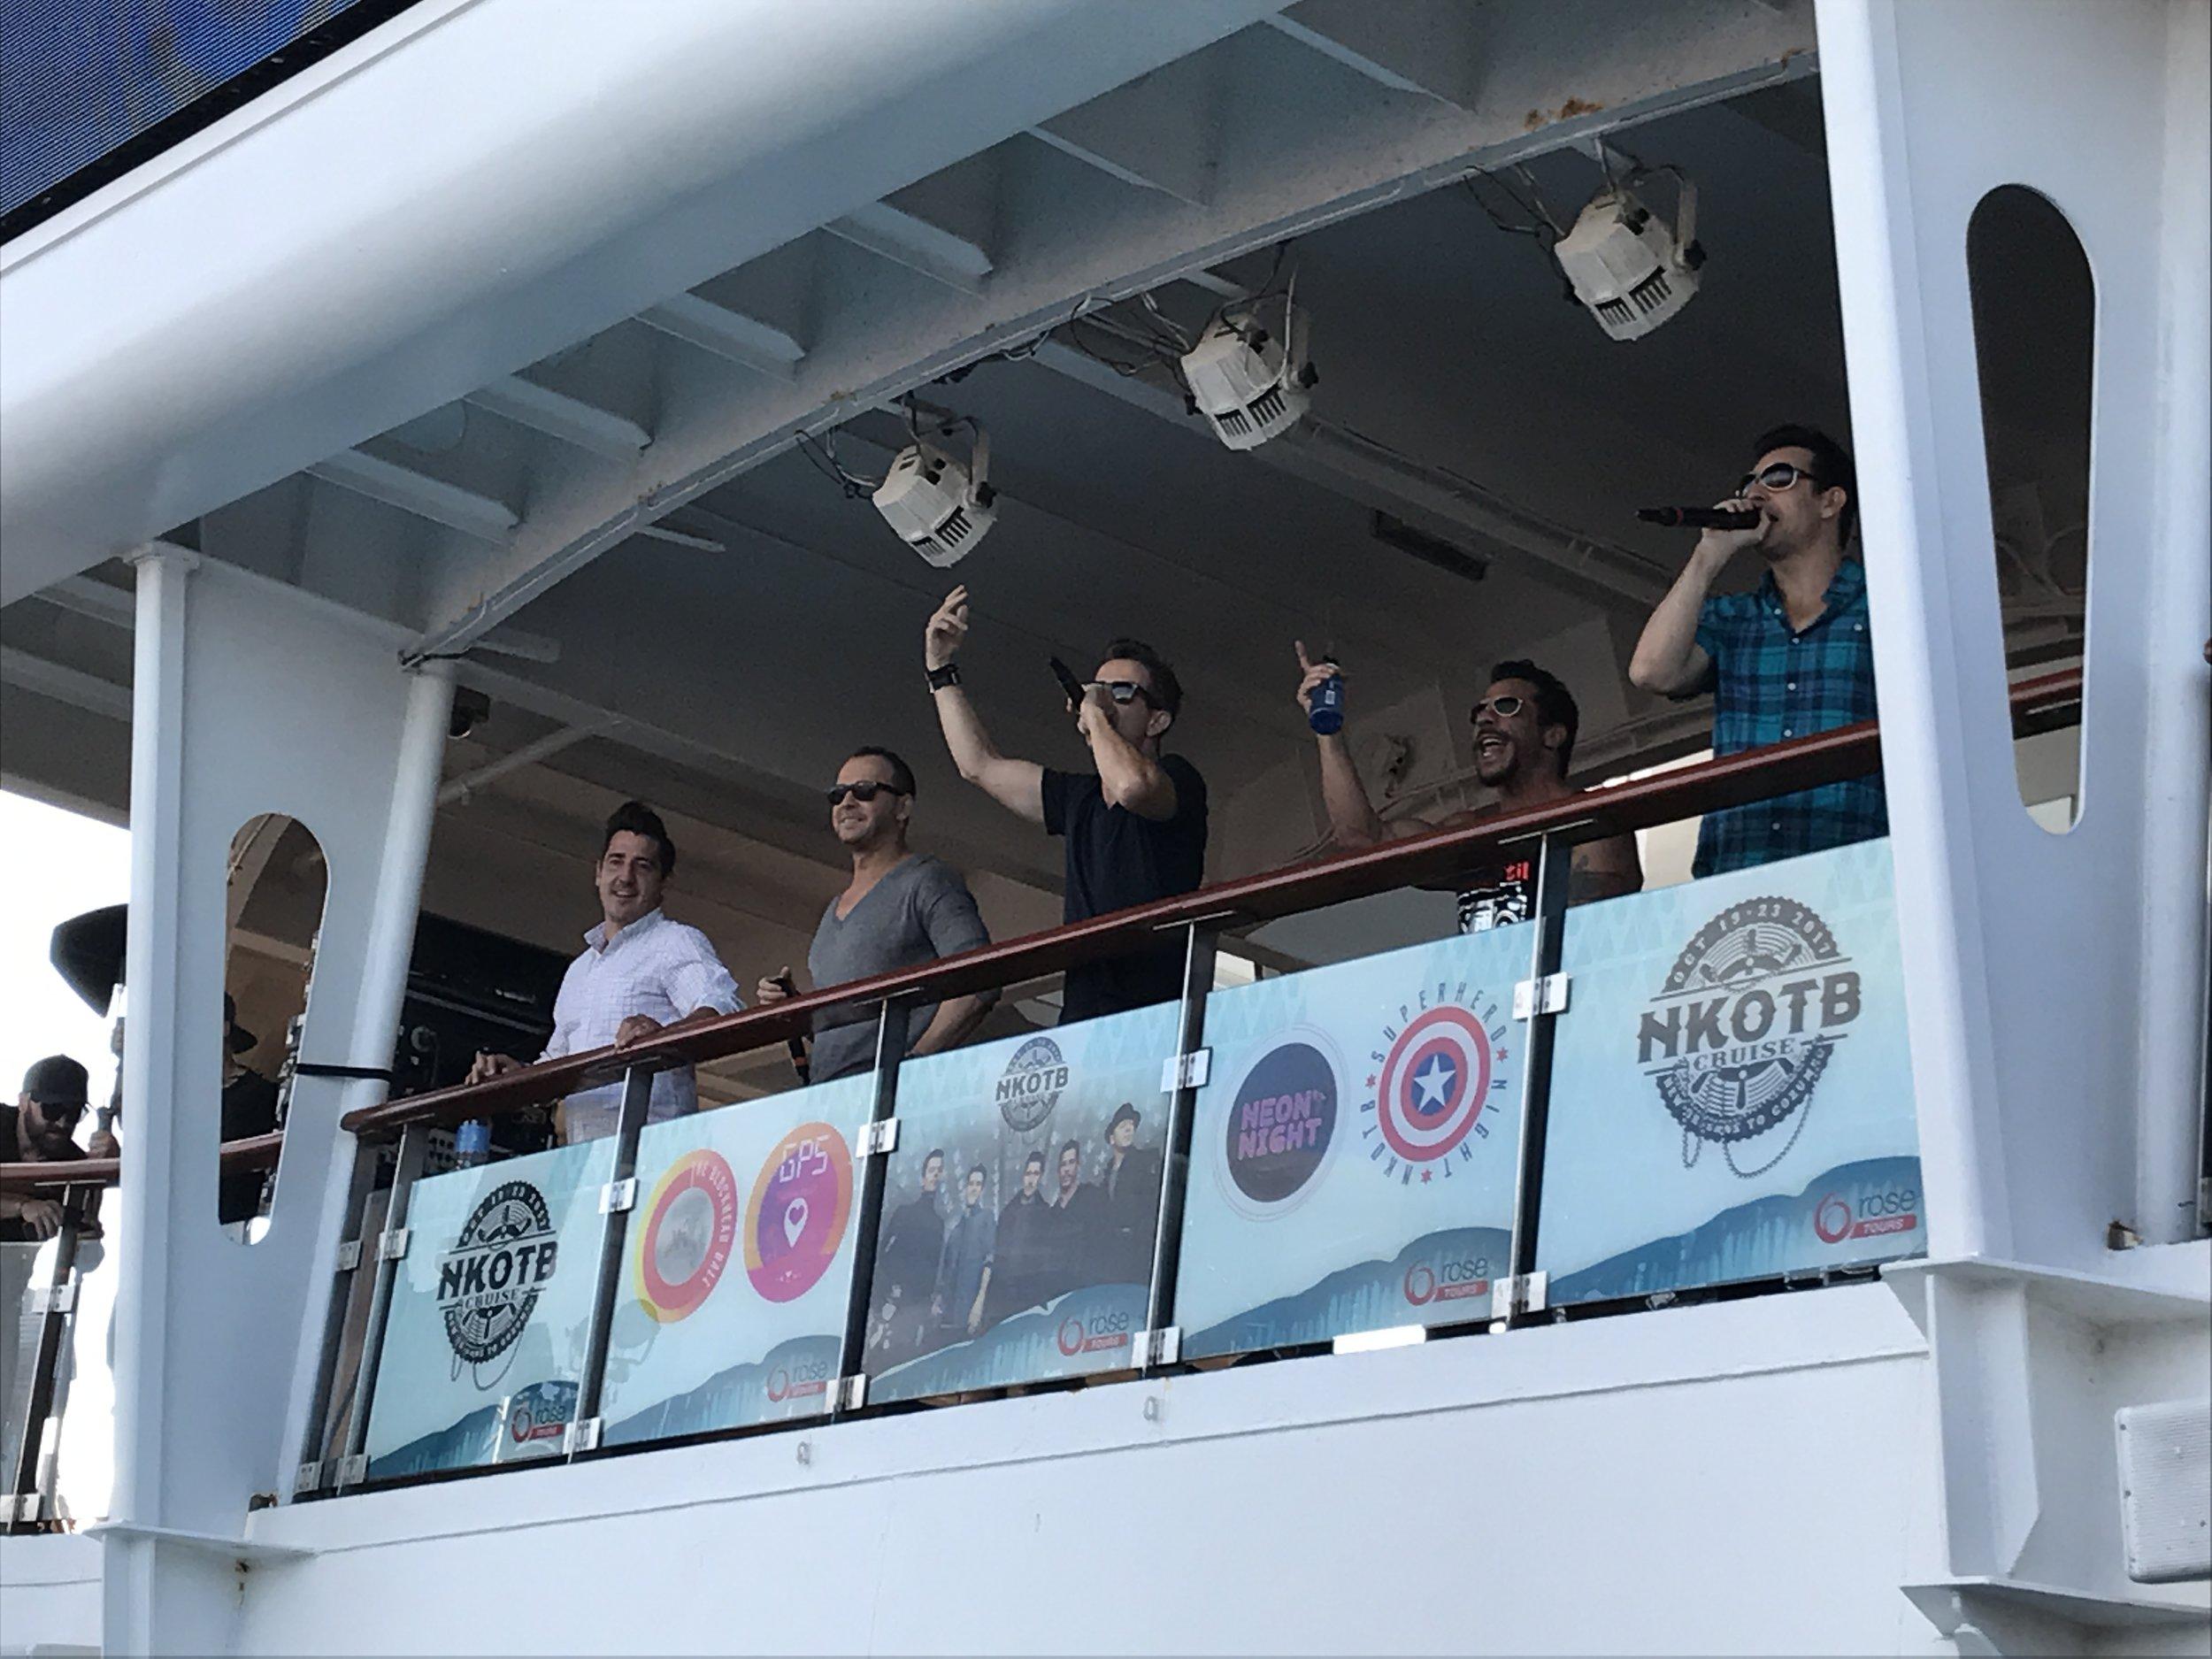 cruise sail away party.JPG